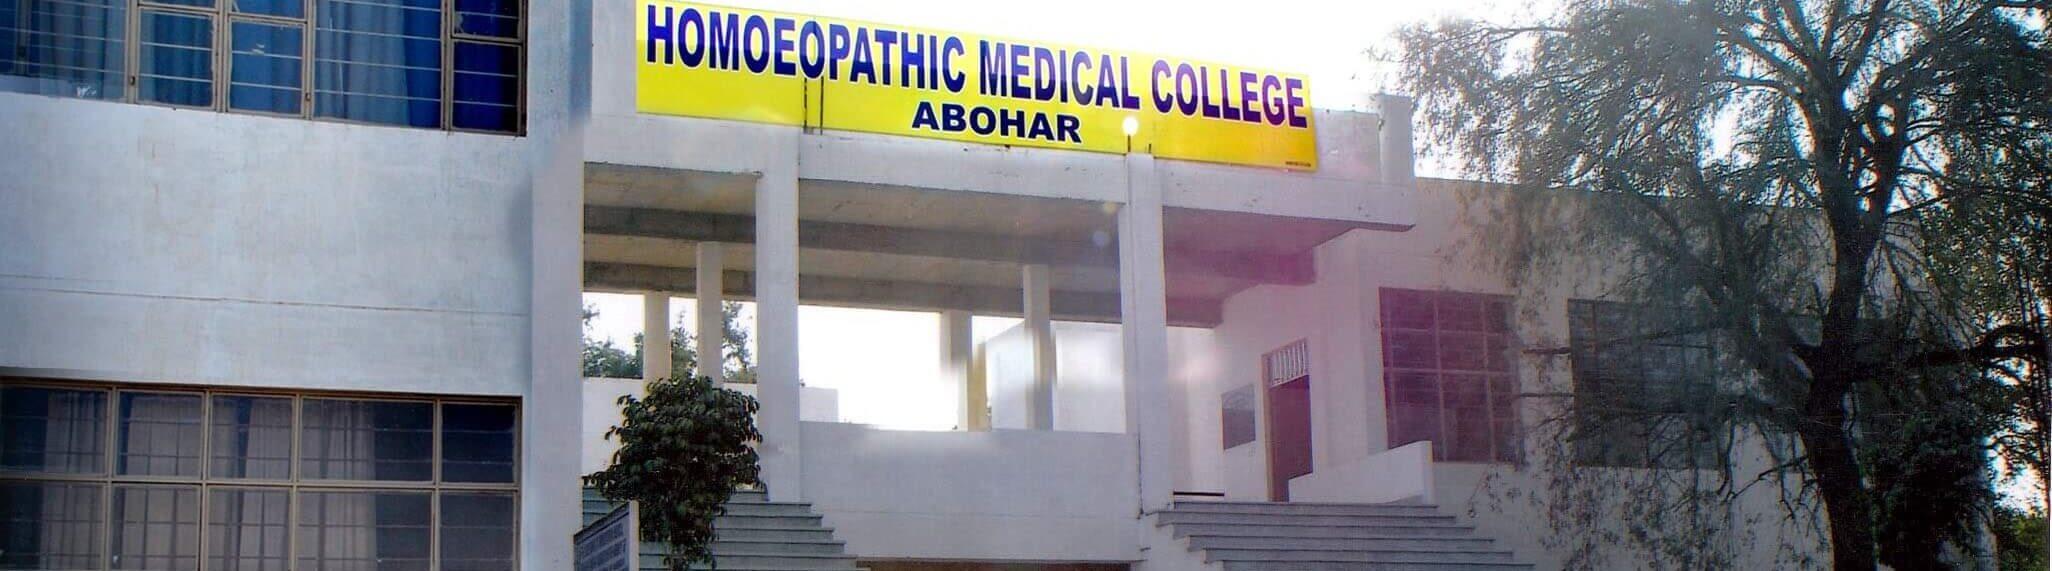 Homoeopathic Medical College, Abohar